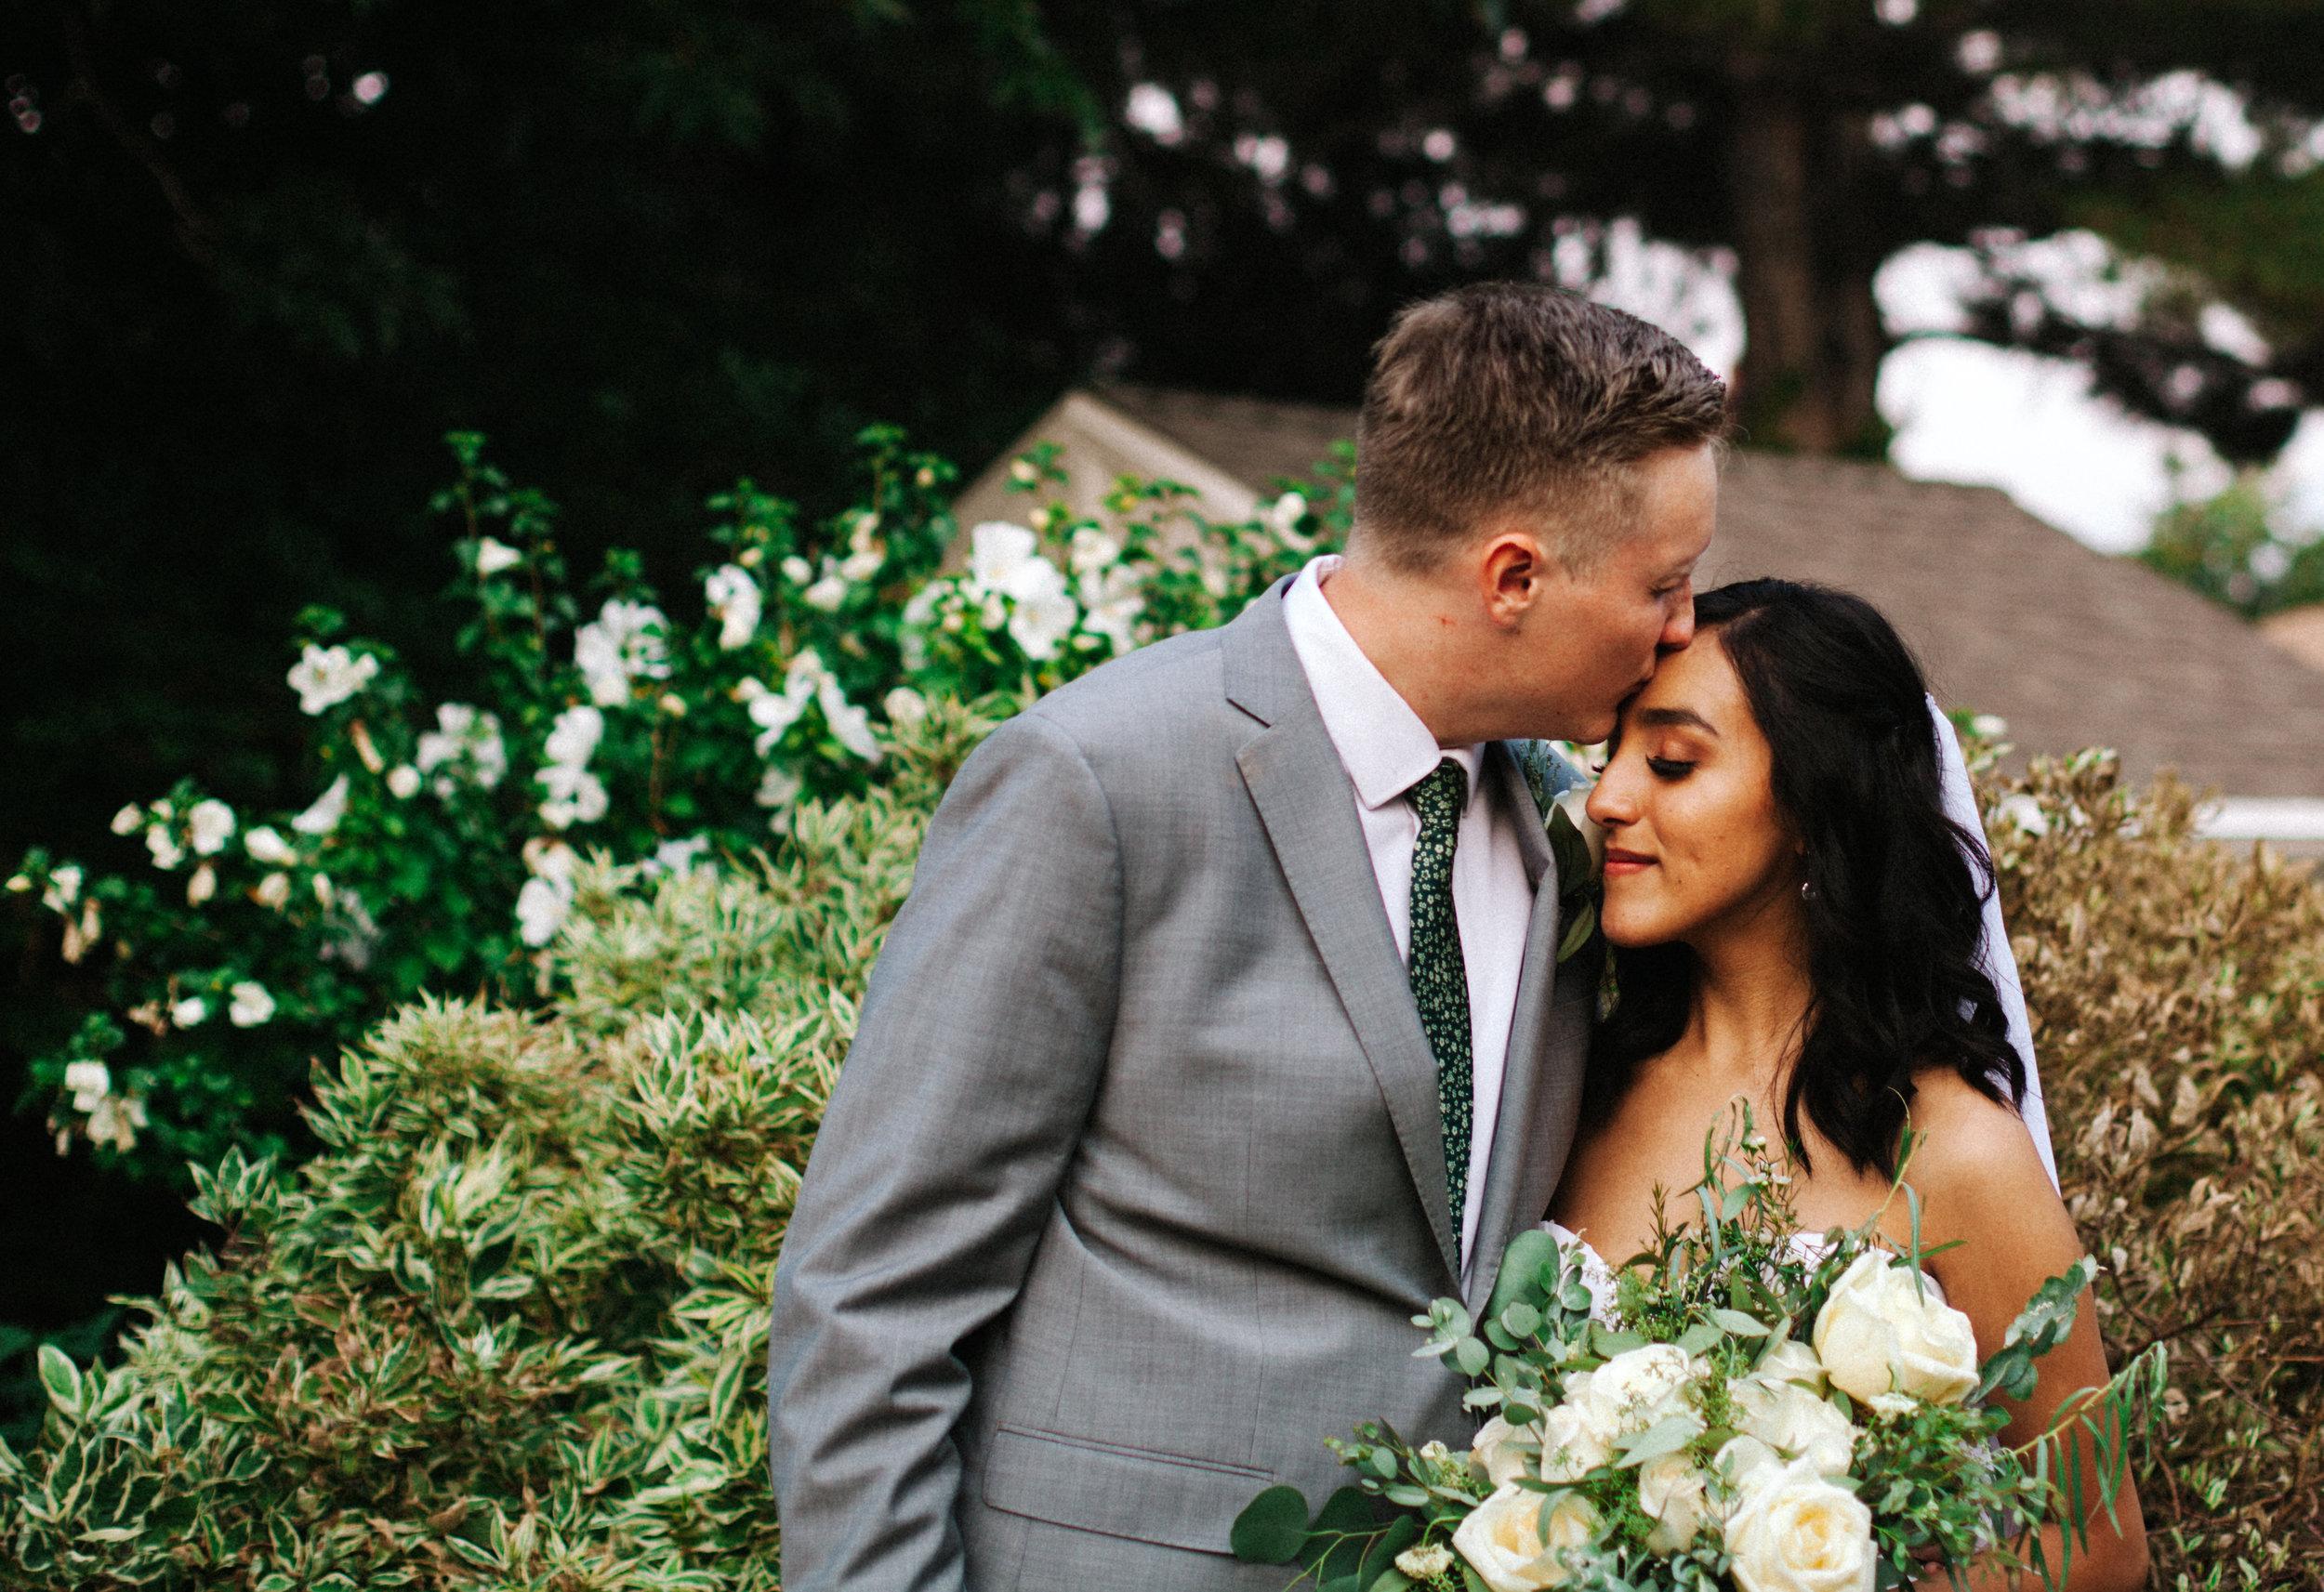 Salt Lake City Wedding - Salt Lake Wedding Photographer - Utah Wedding - Utah Wedding Photographer - SLC Wedding - SLC Wedding Photos - Murray UT Wedding-9864.jpg